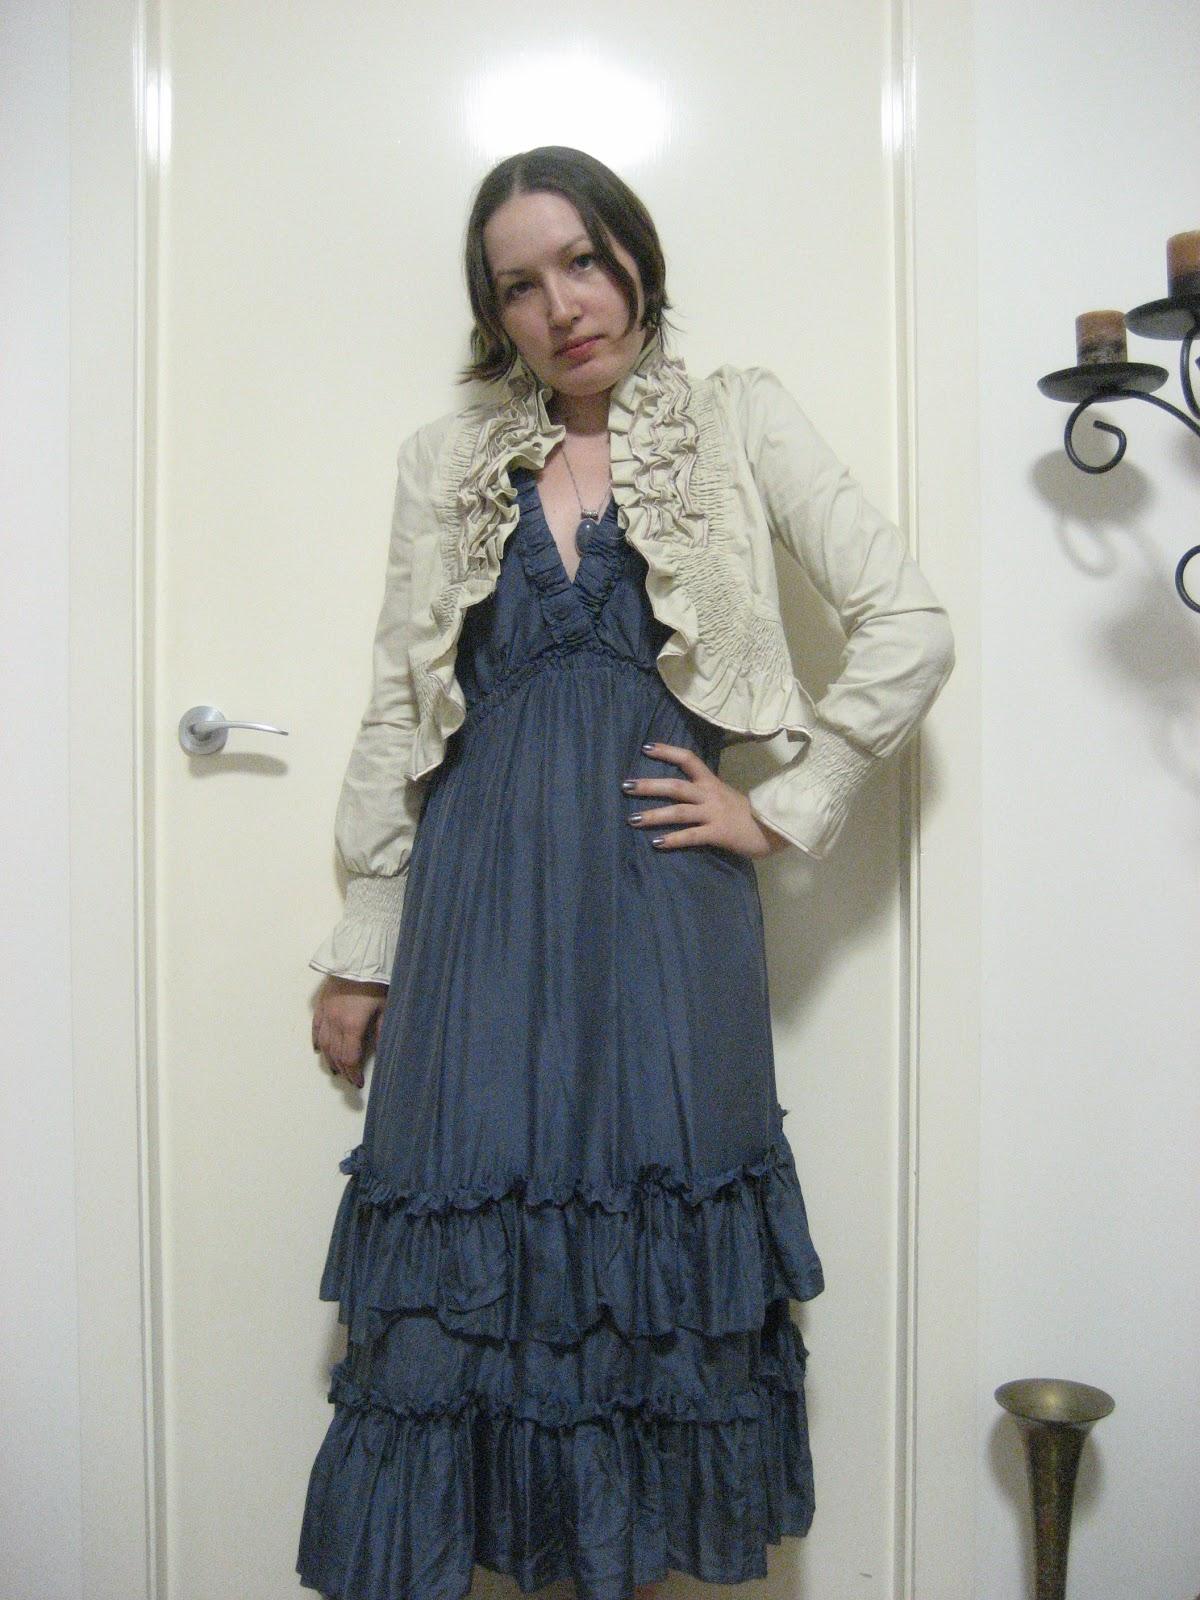 http://3.bp.blogspot.com/-BhJsRUzDGwk/Tv1J8JNstOI/AAAAAAAABdg/cNYoNf6y1jY/s1600/IMG_0797.JPG